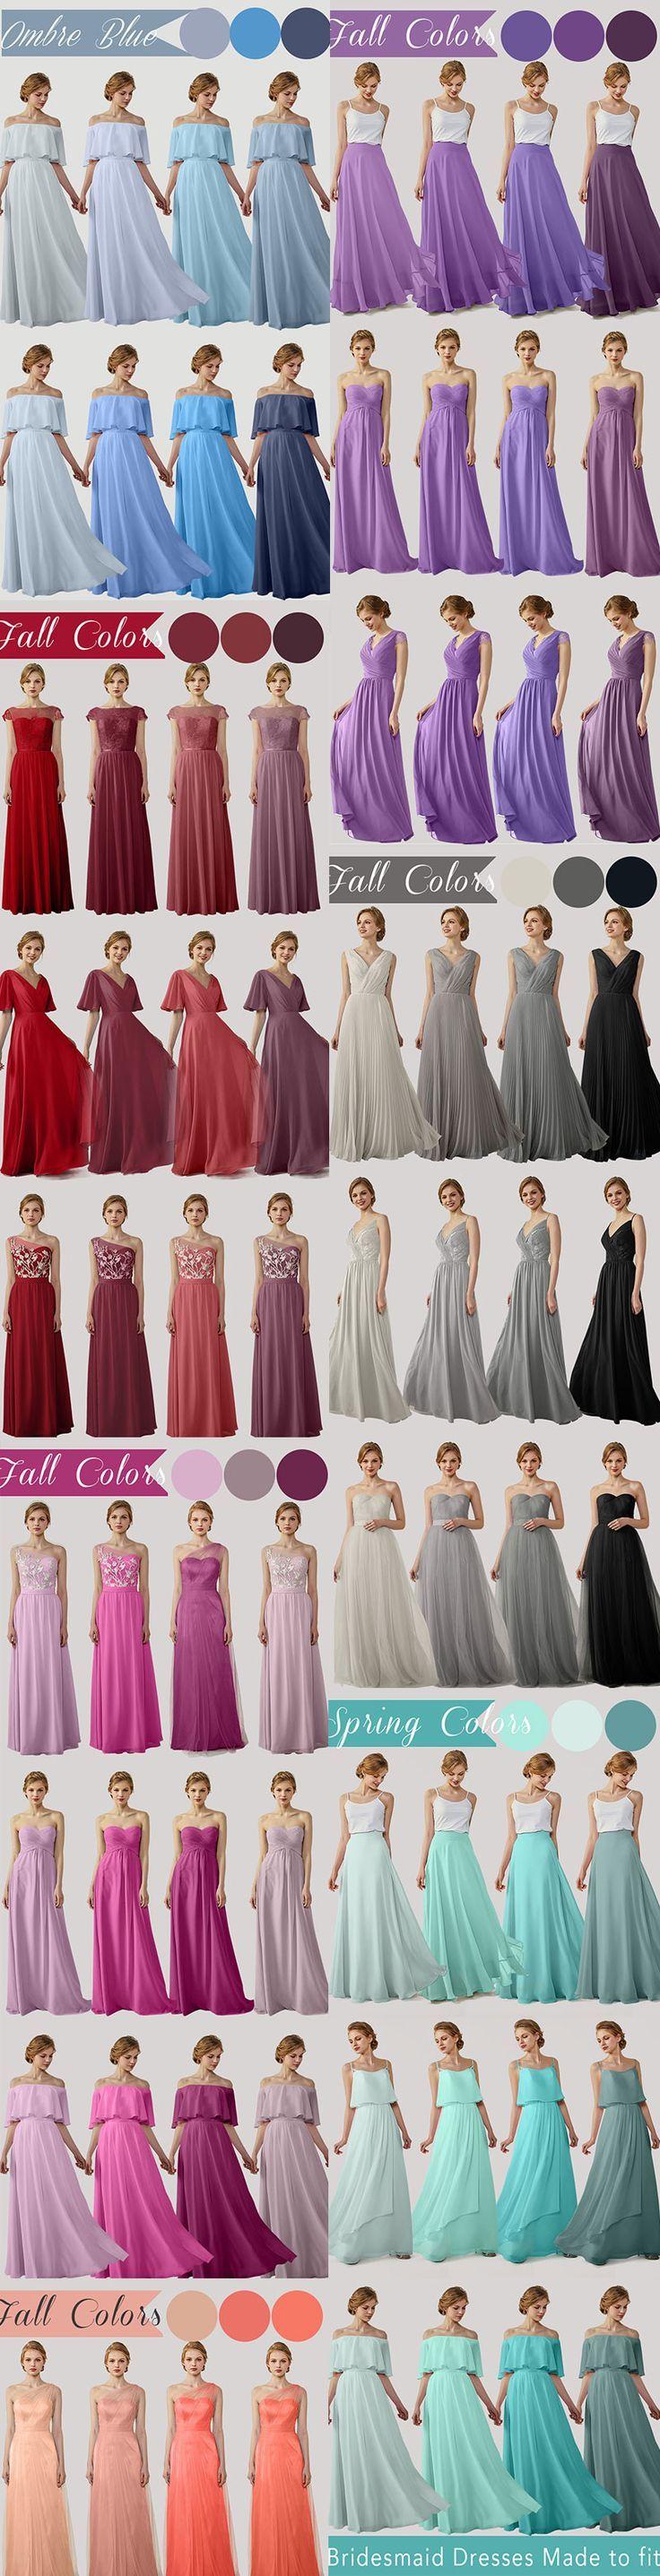 2018 all Elegant V-neck bridesmaid dresses illusion one shoulder dresses with la #fashion #style #stylish #love #cute